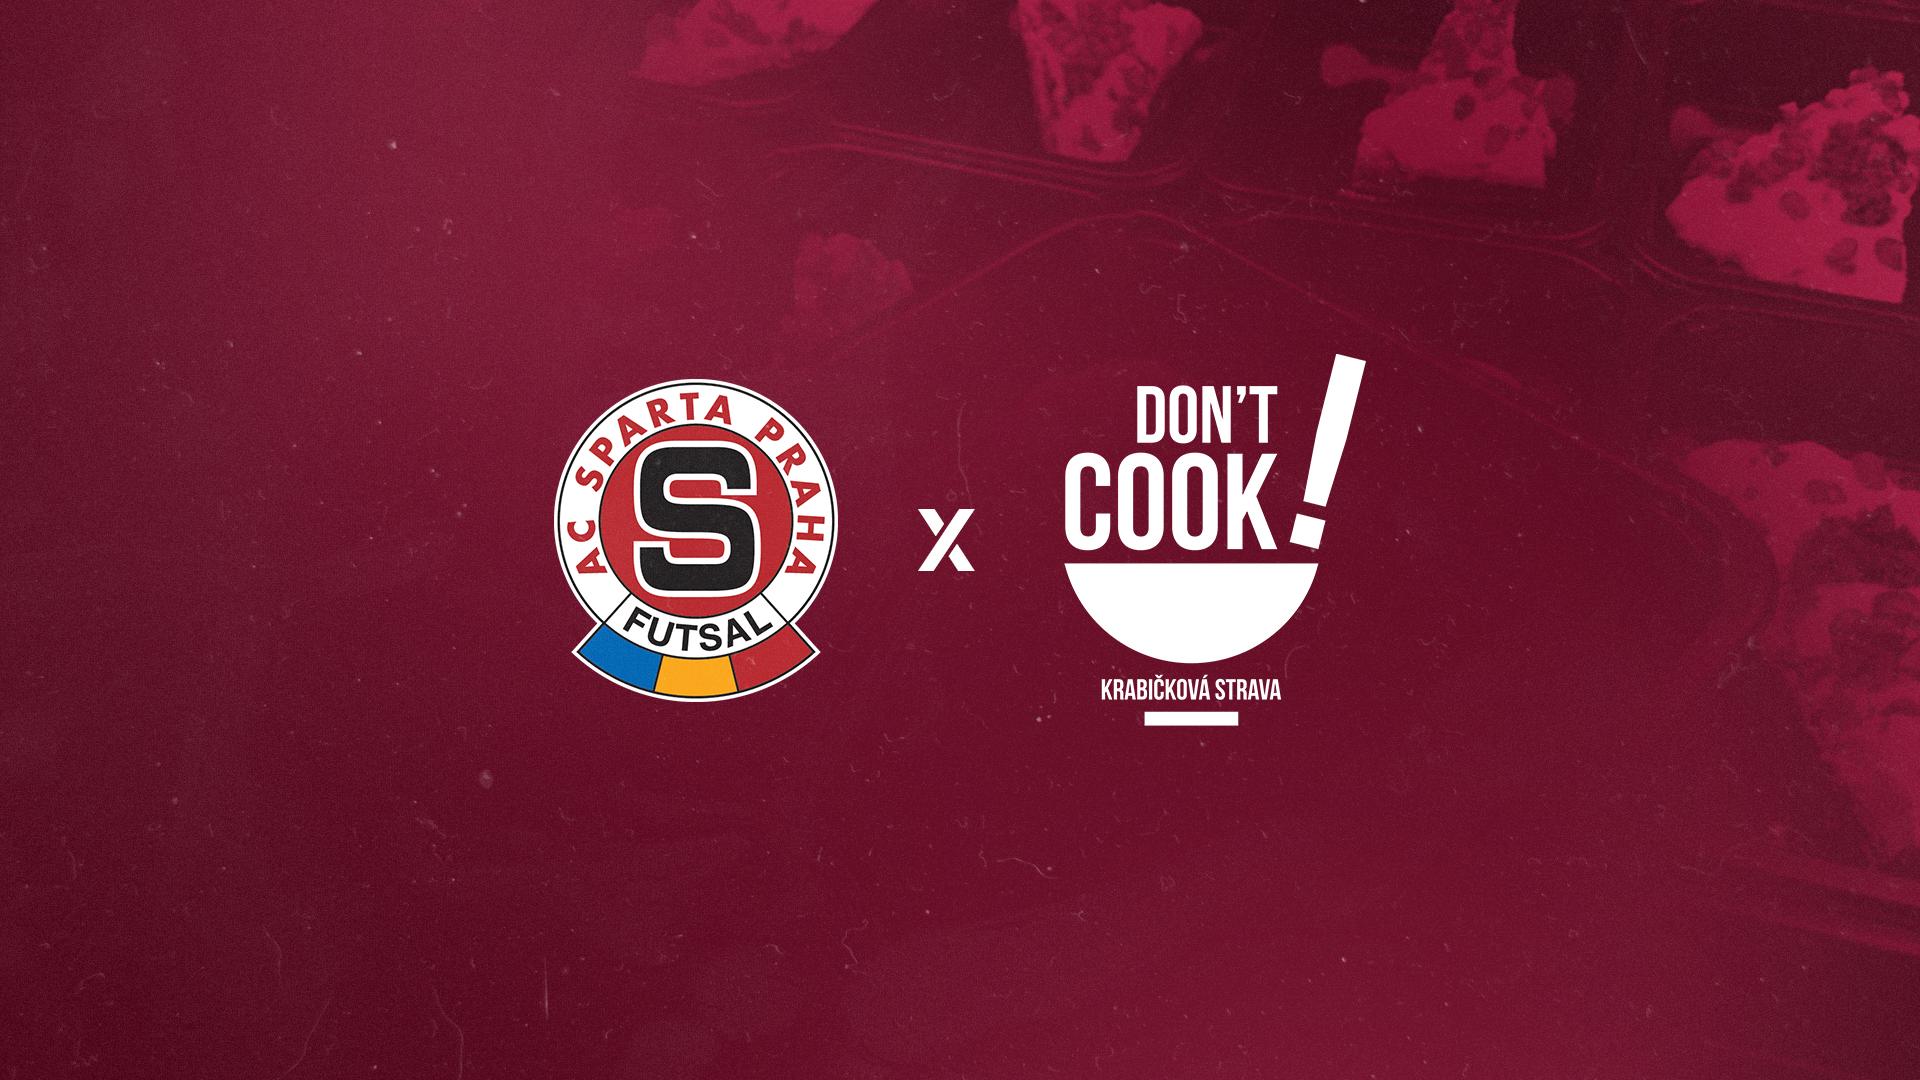 Sparta spolupracuje s firmou Don't Cook!